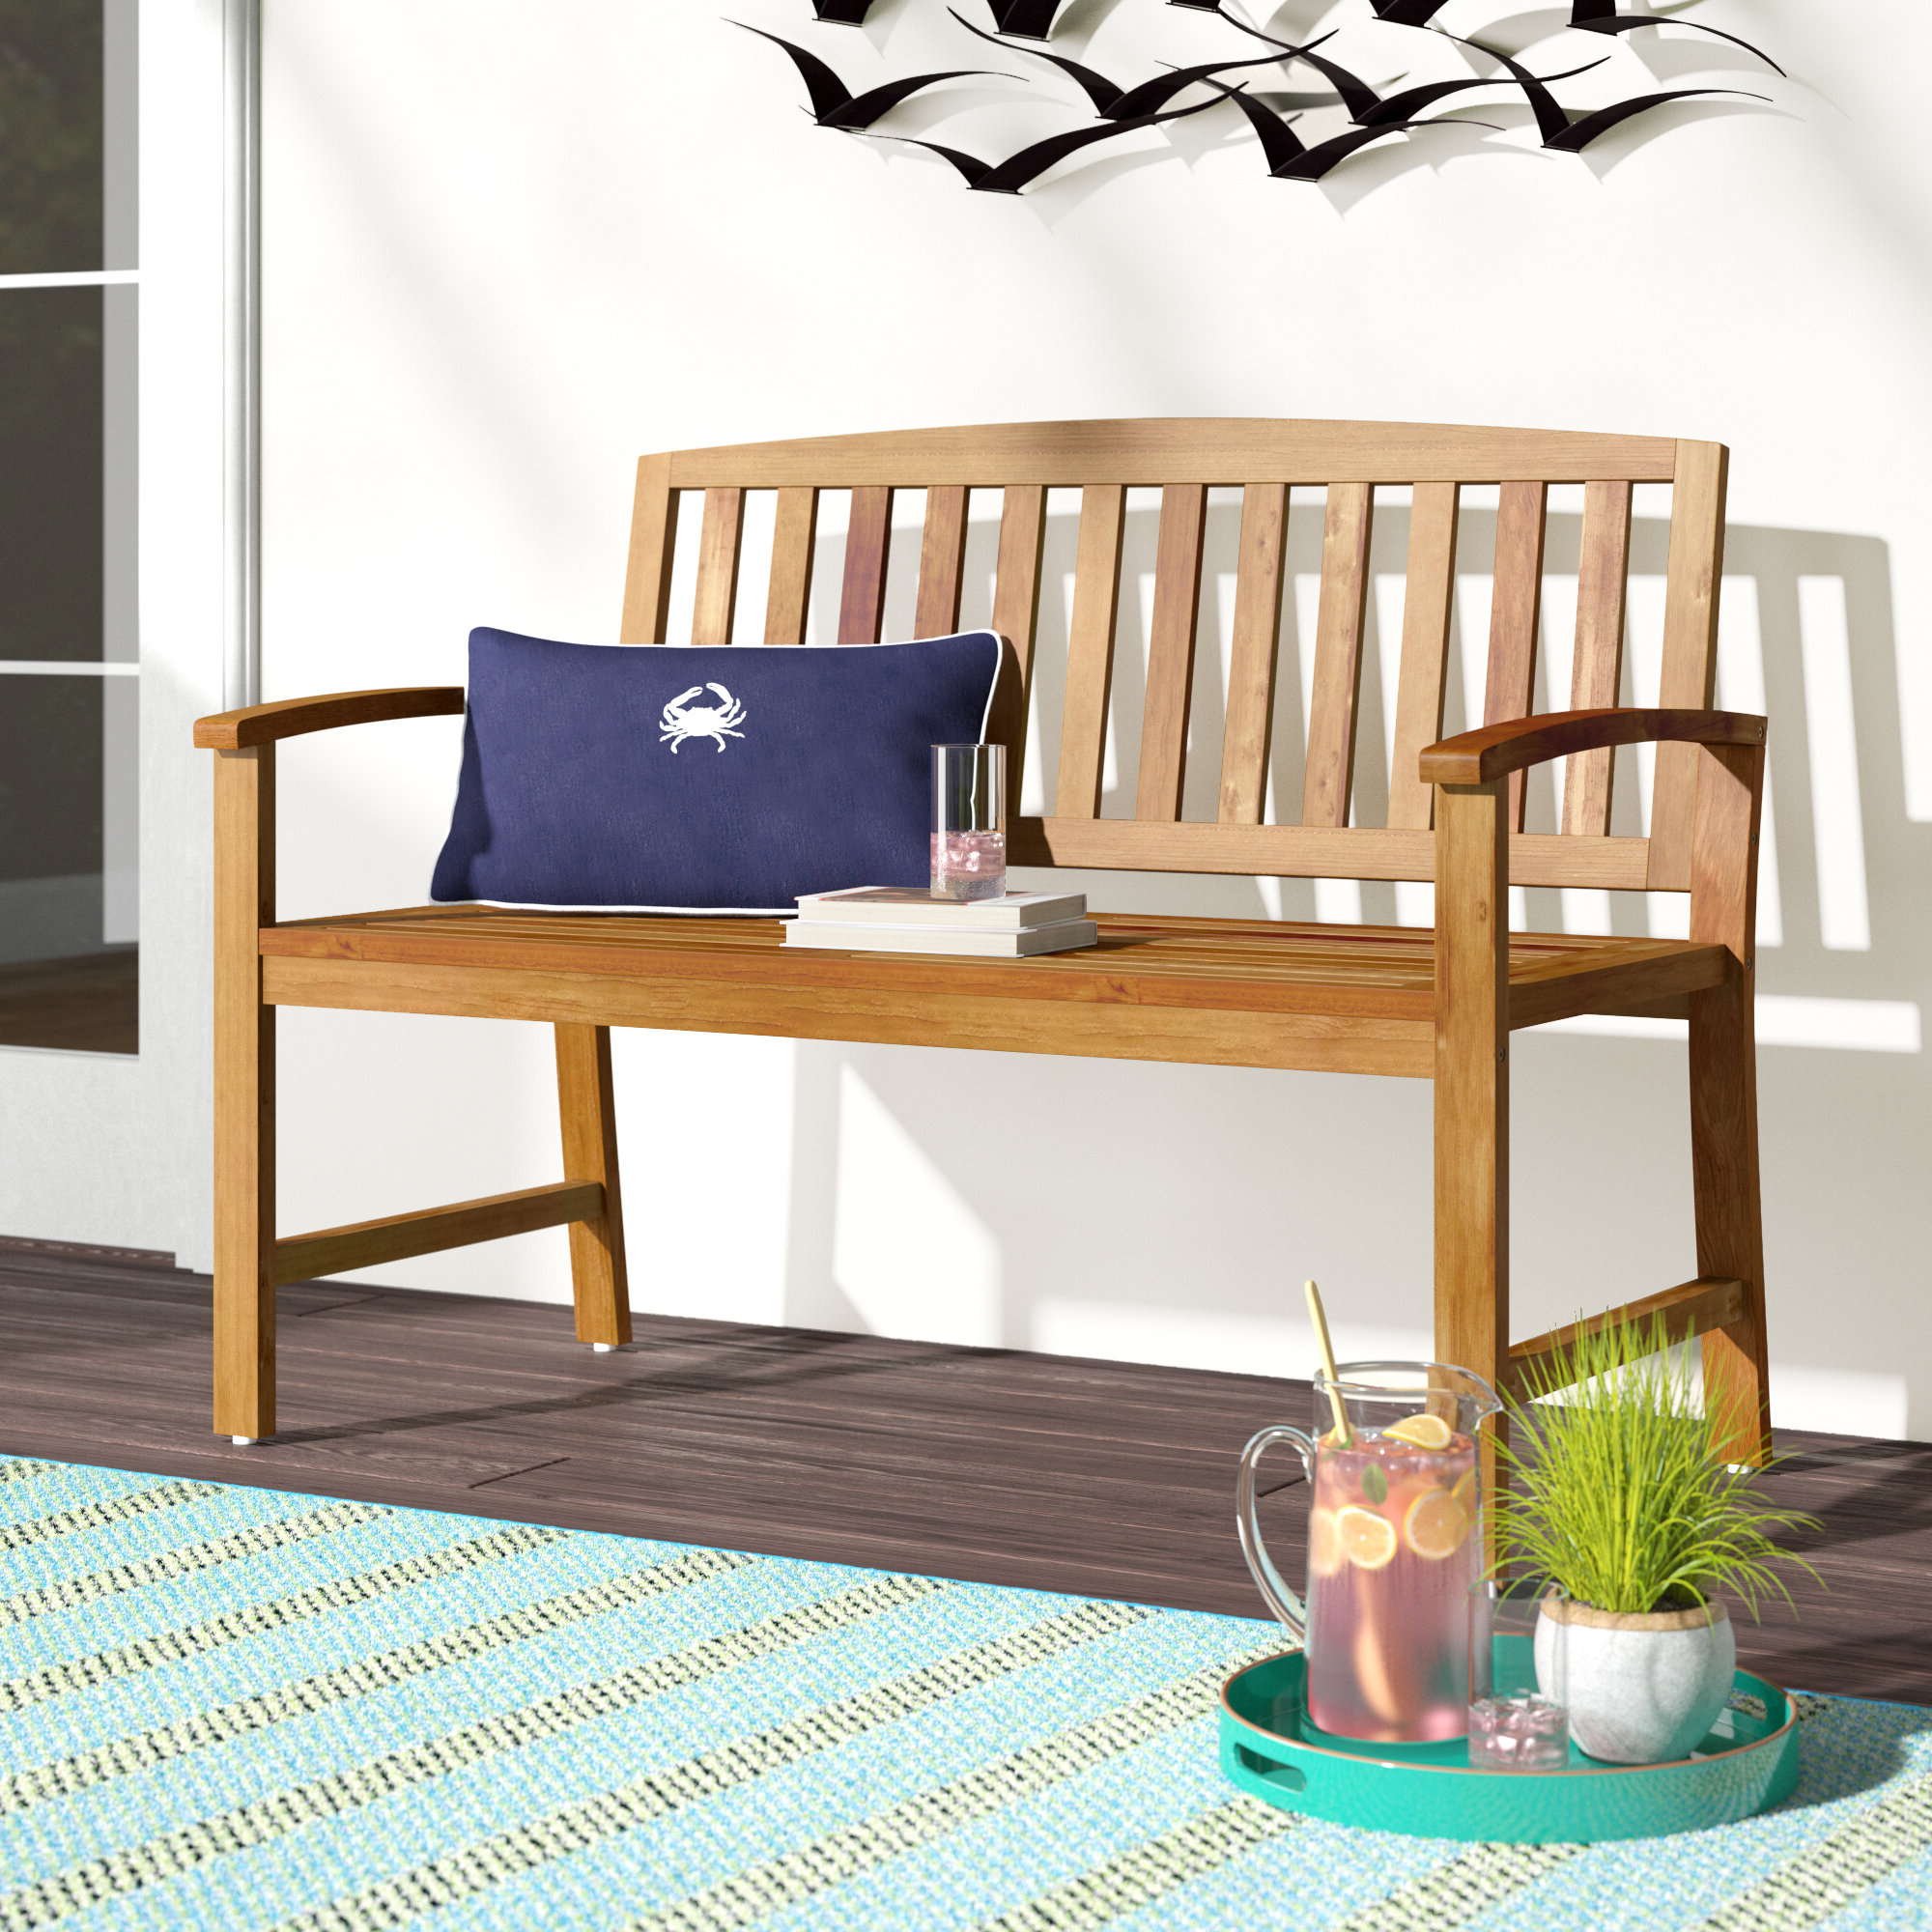 Well Known Beachcrest Home Leora Wooden Garden Bench & Reviews With Regard To Leora Wooden Garden Benches (View 2 of 30)